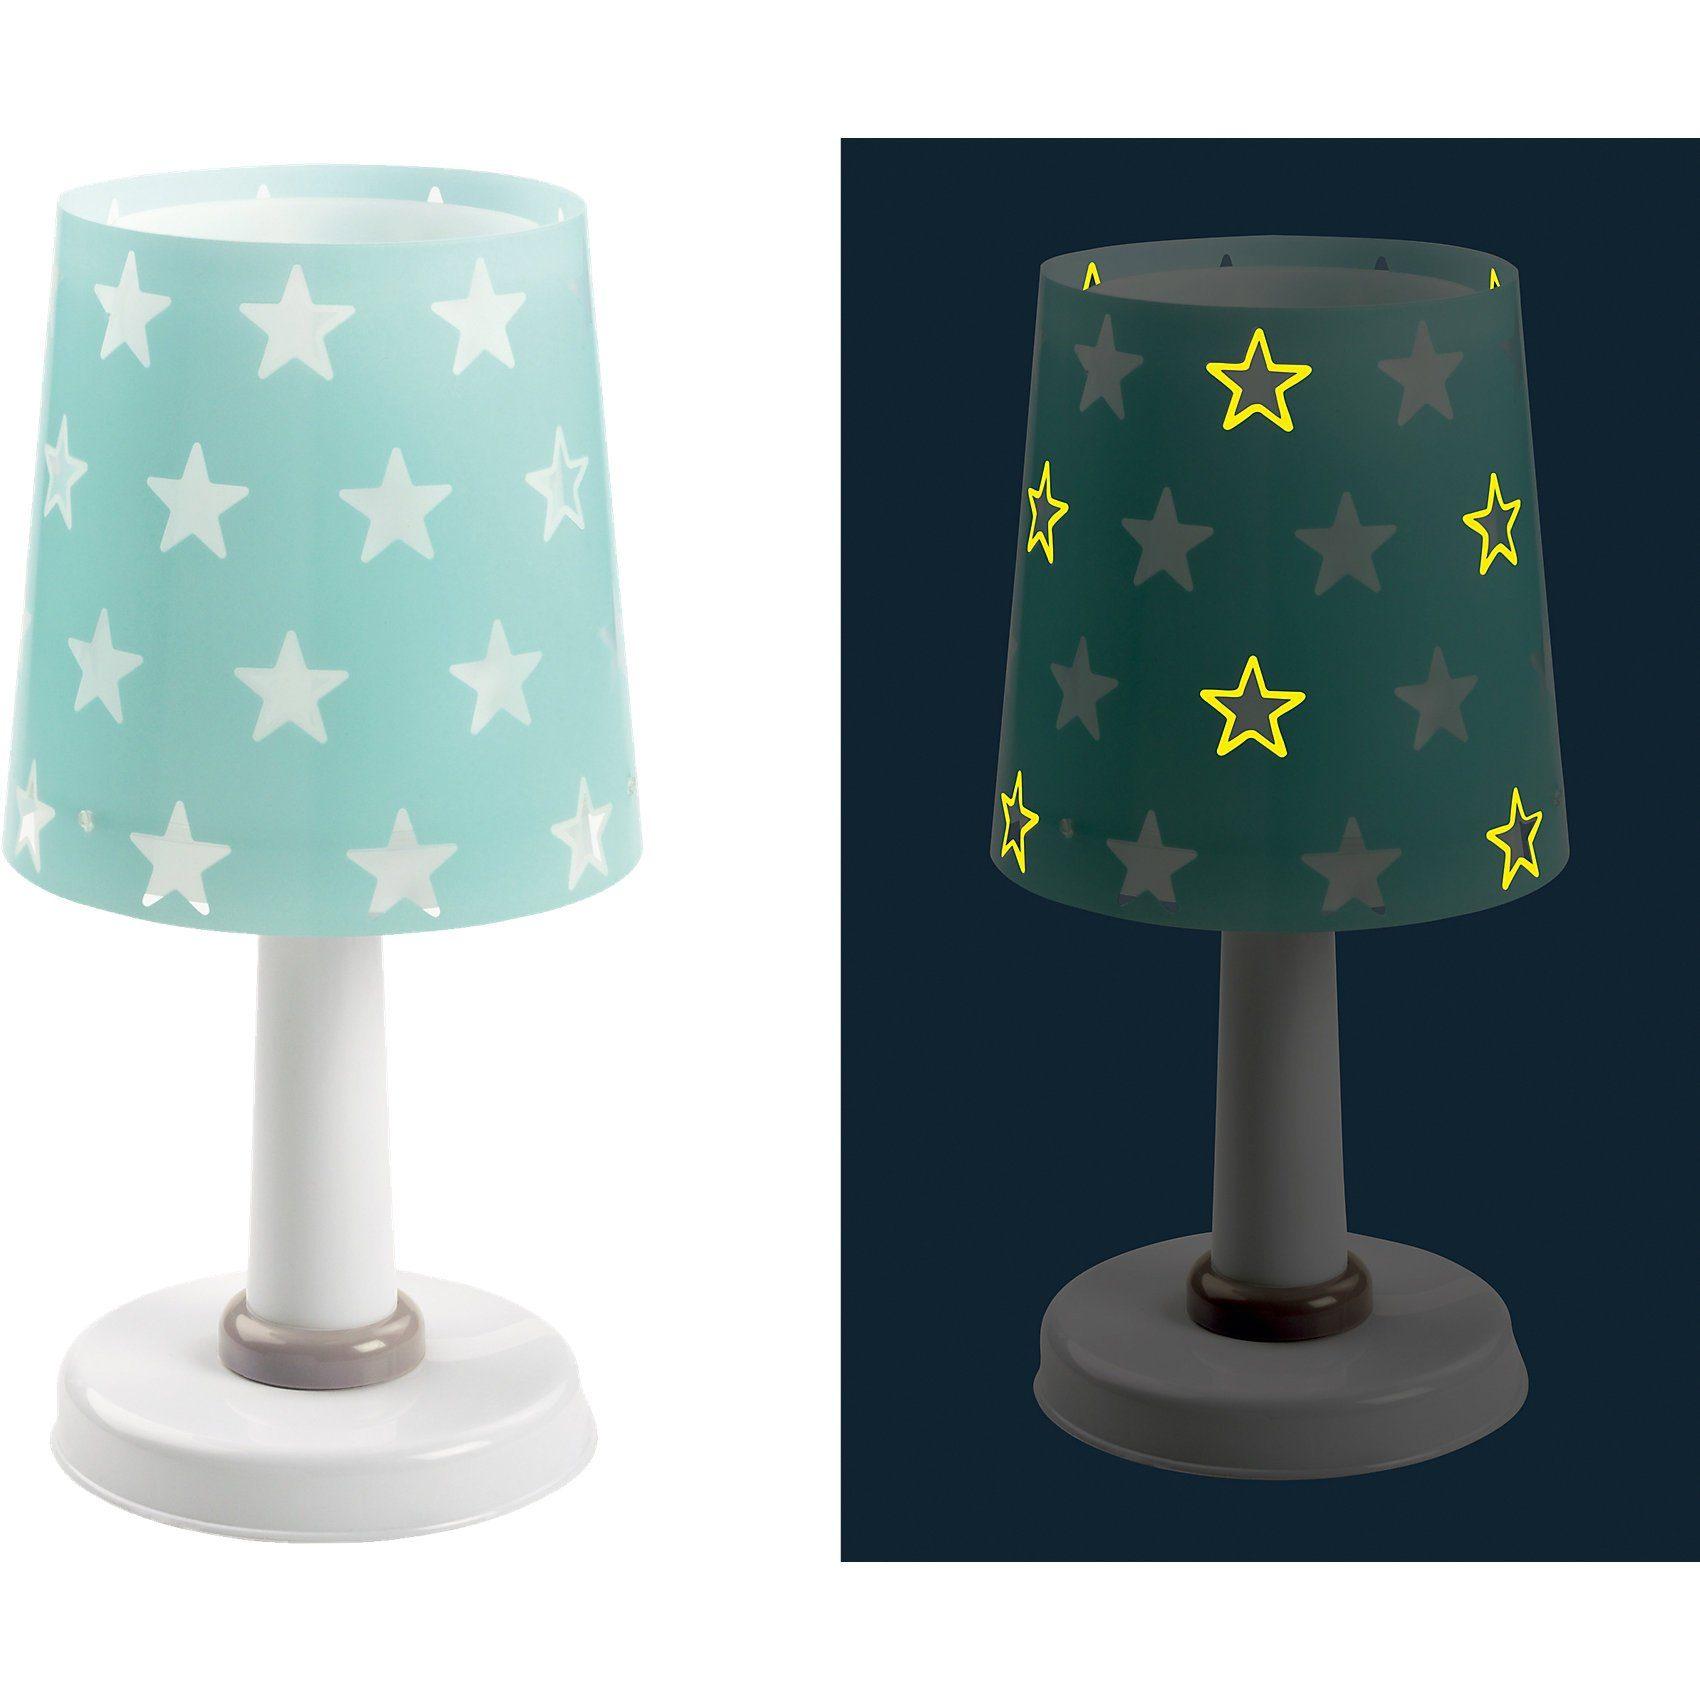 Dalber Tischlampe STARS, Glow in the dark, türkis